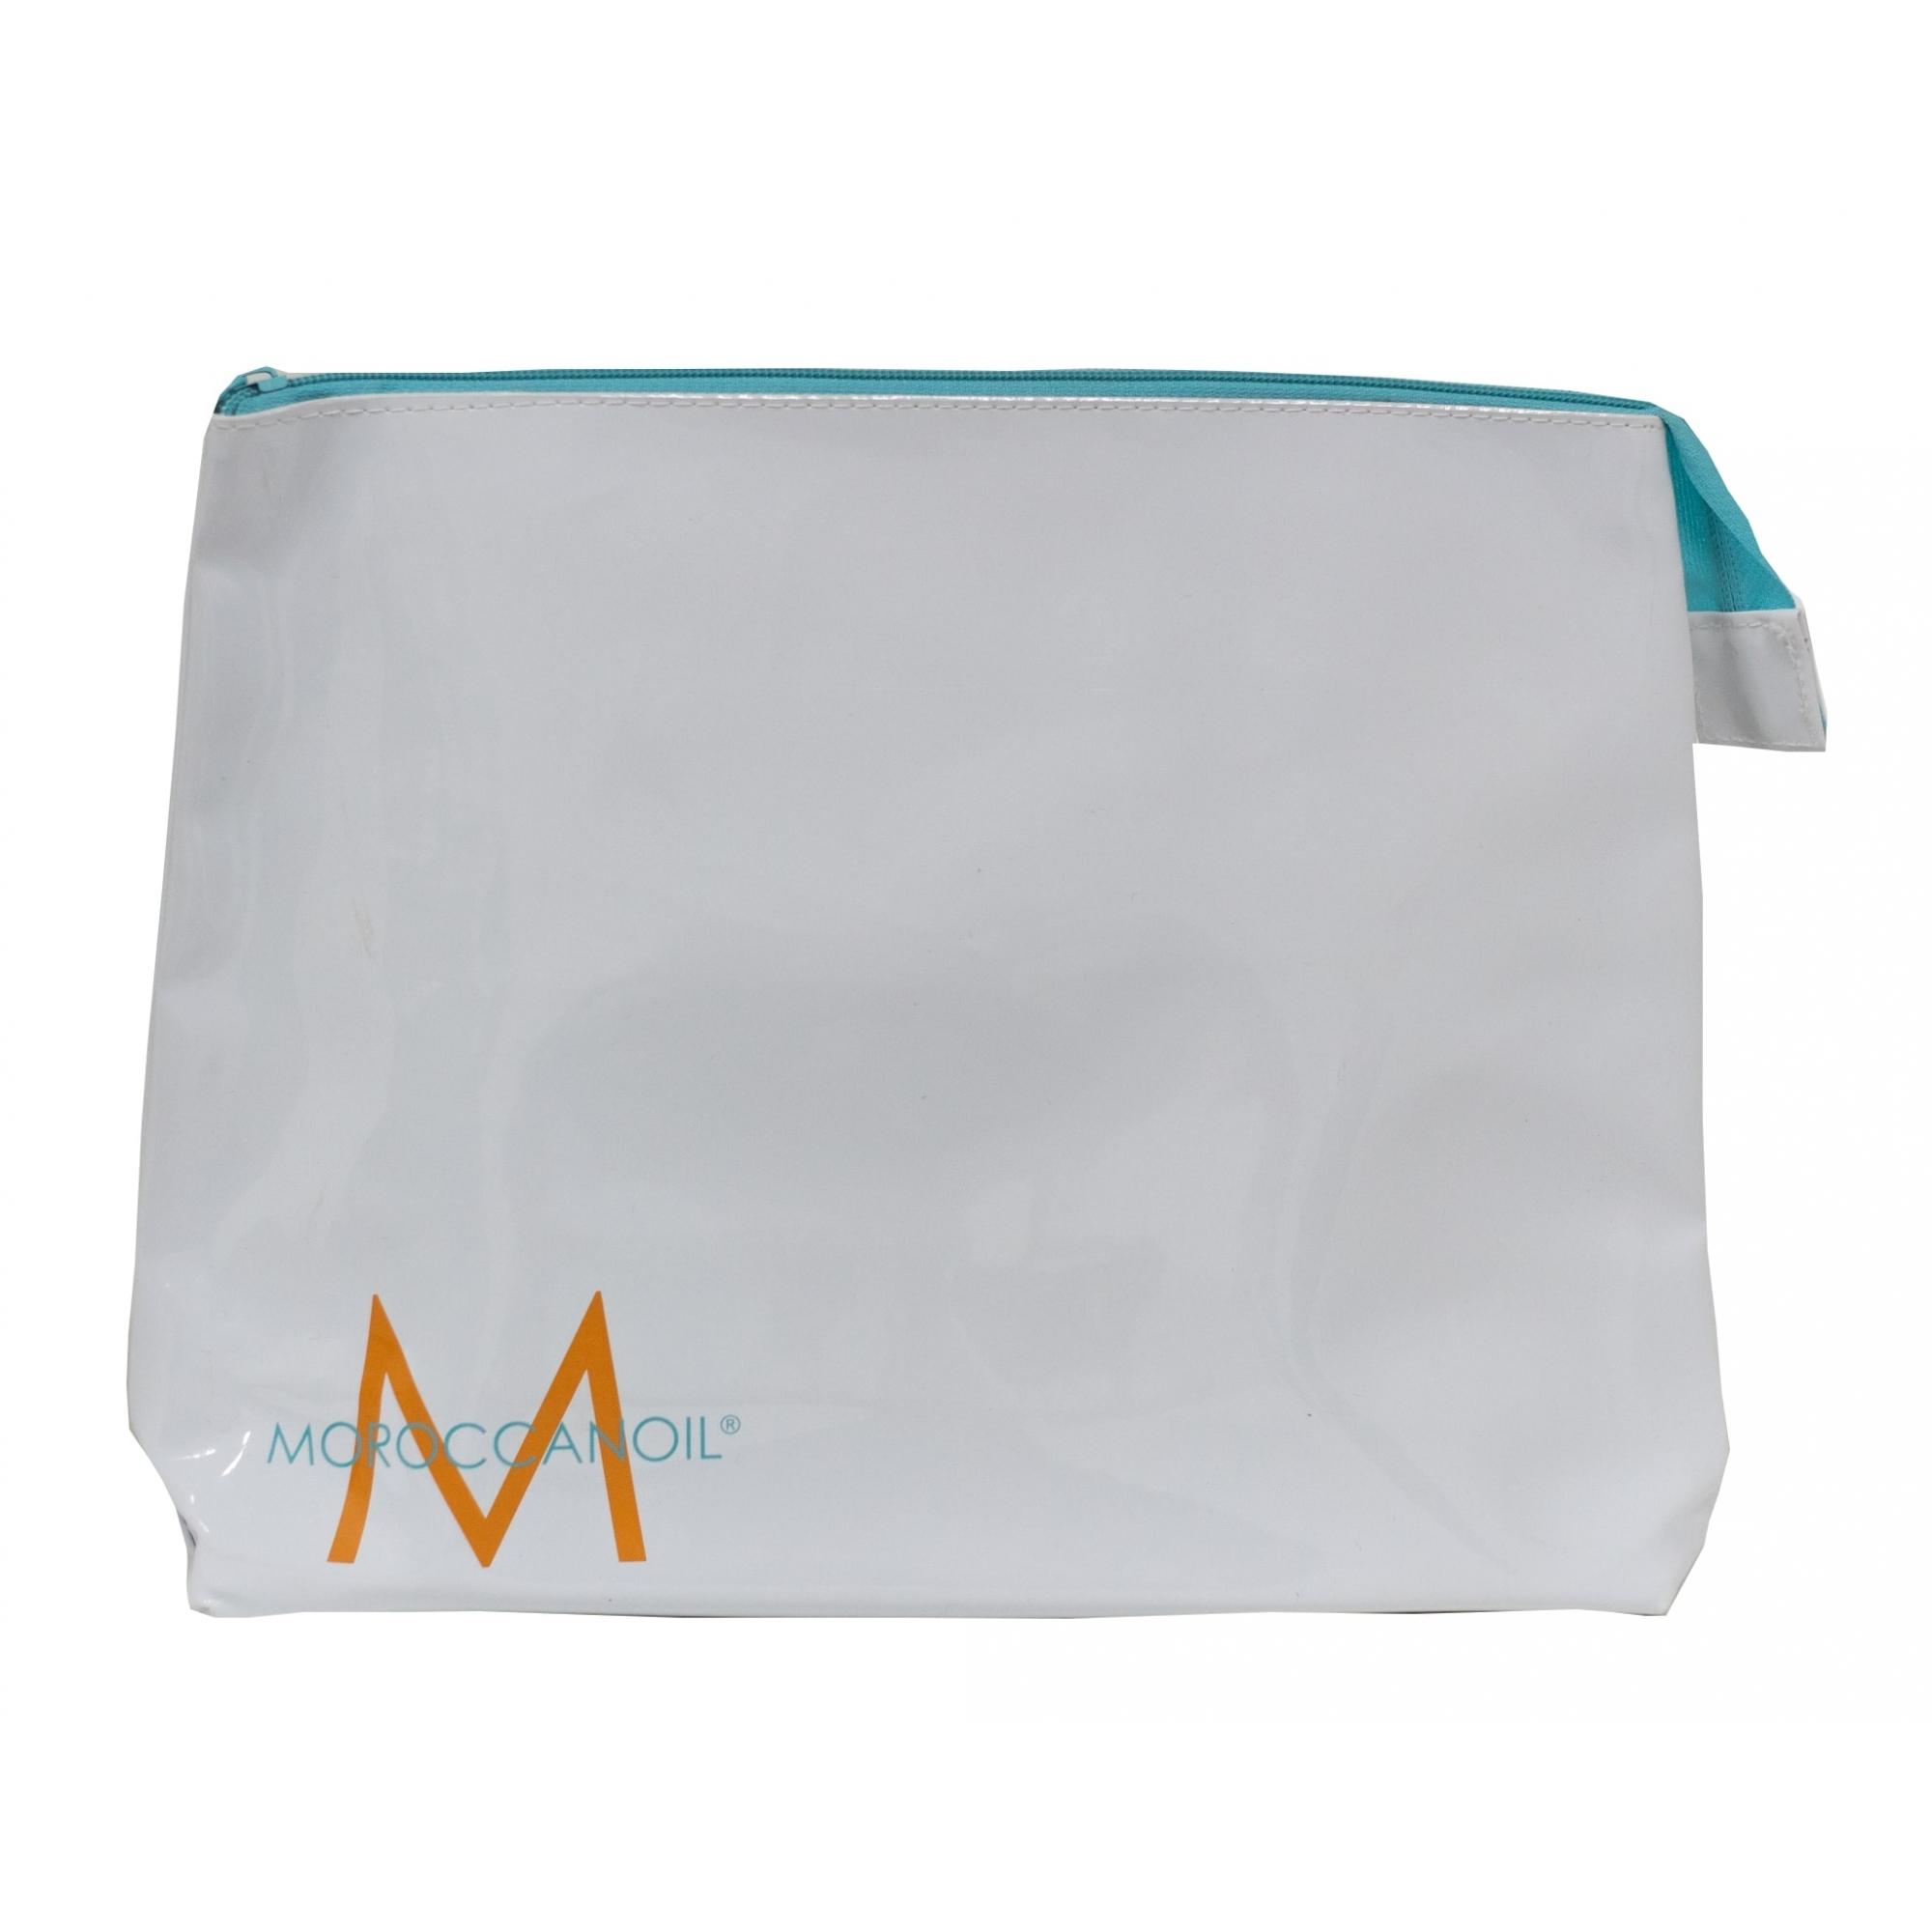 Moroccanoil Necessaire Branca com zíper azul